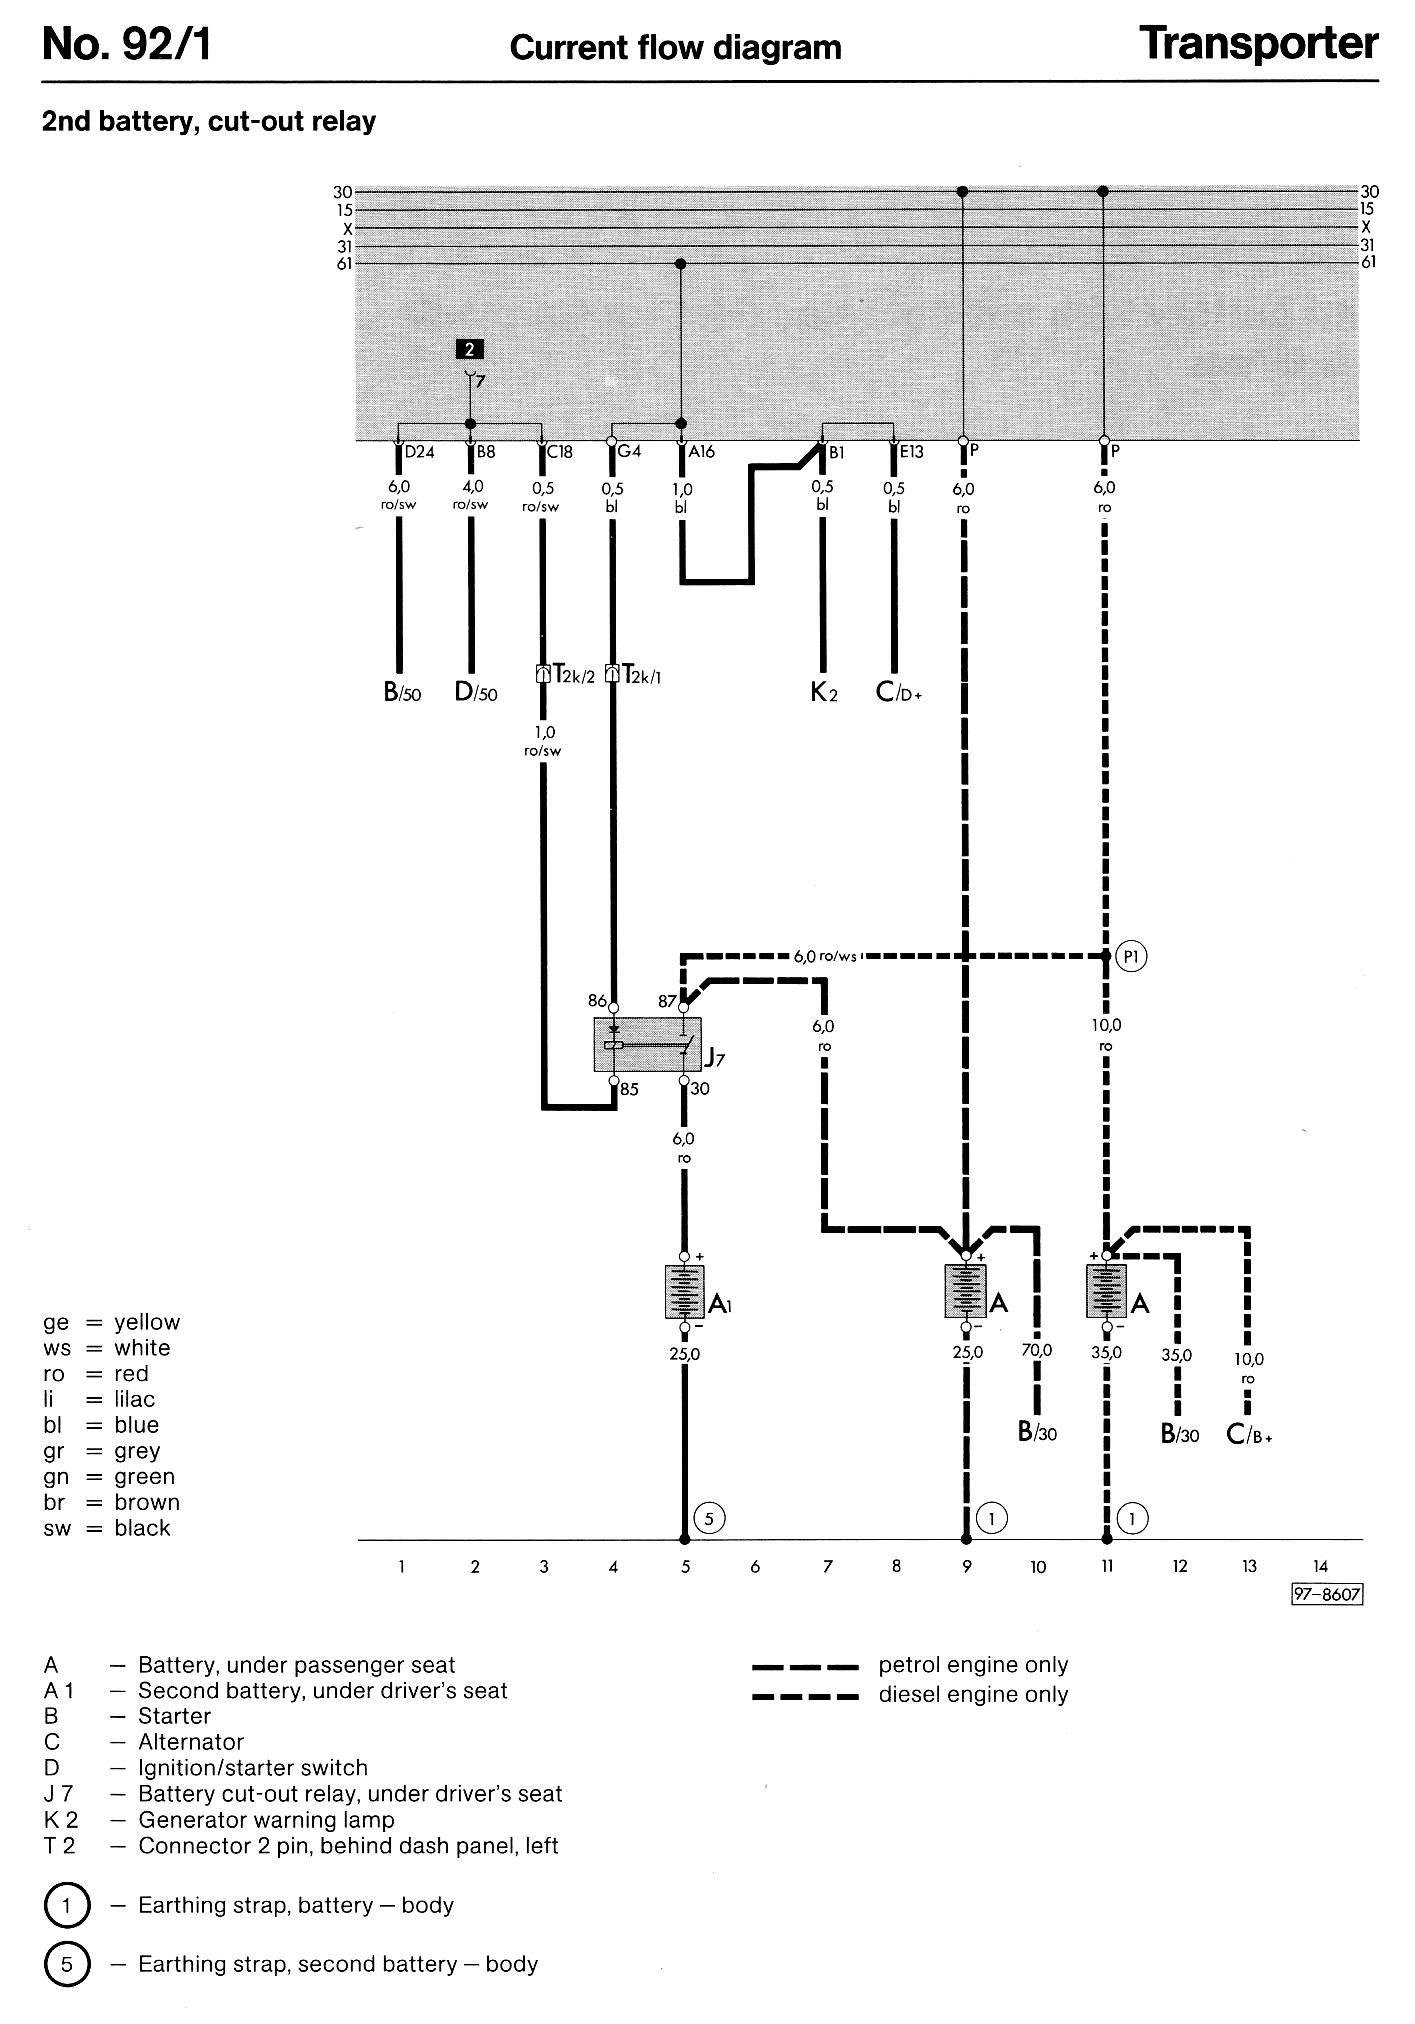 66 Vw Transporter Wiring Diagram | Best Wiring Library - Electric Heater Wiring Diagram